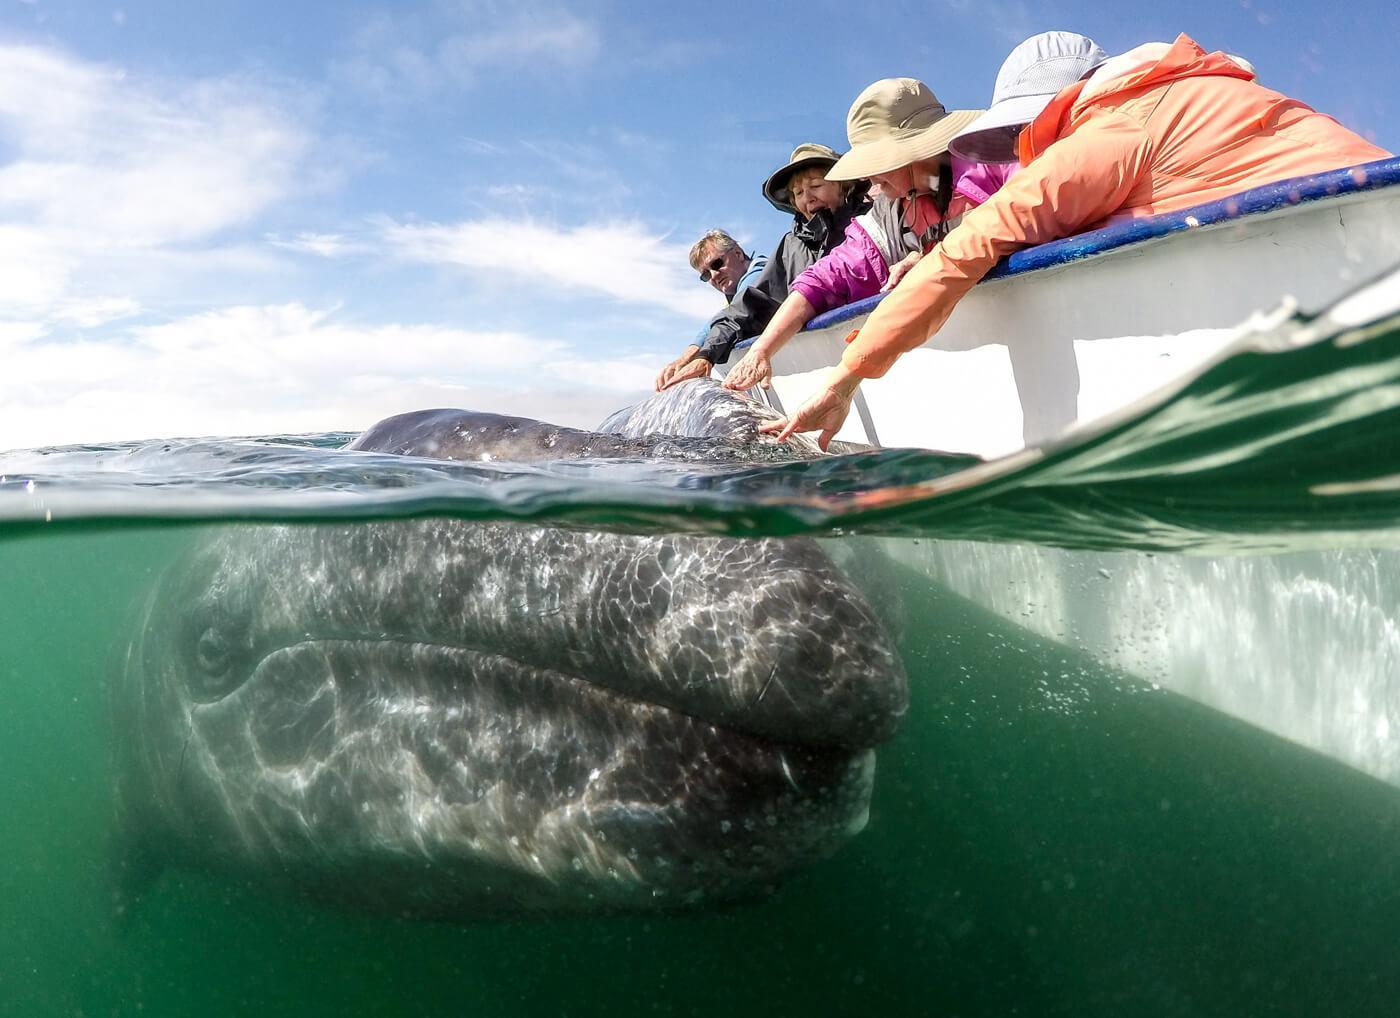 A friendly gray whale approaches our panga in Laguna San Ignacio. © Jose Sanchez